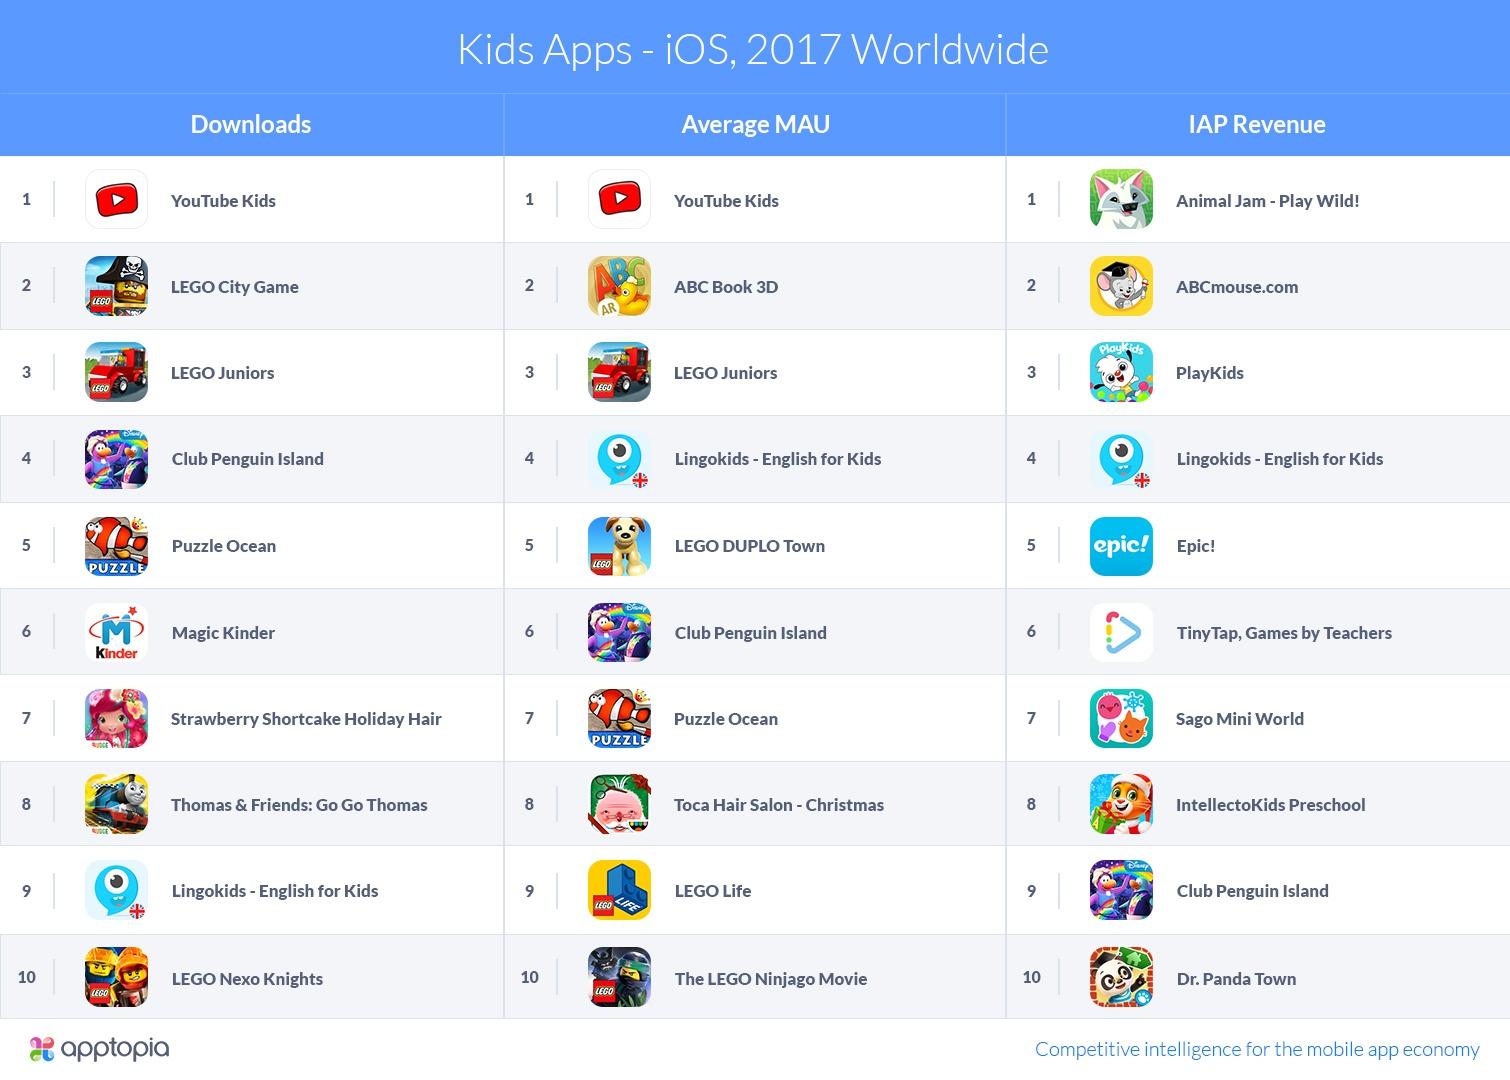 Apptopia-KidsApps-iOS2017Worldwide-v1 (2).jpg